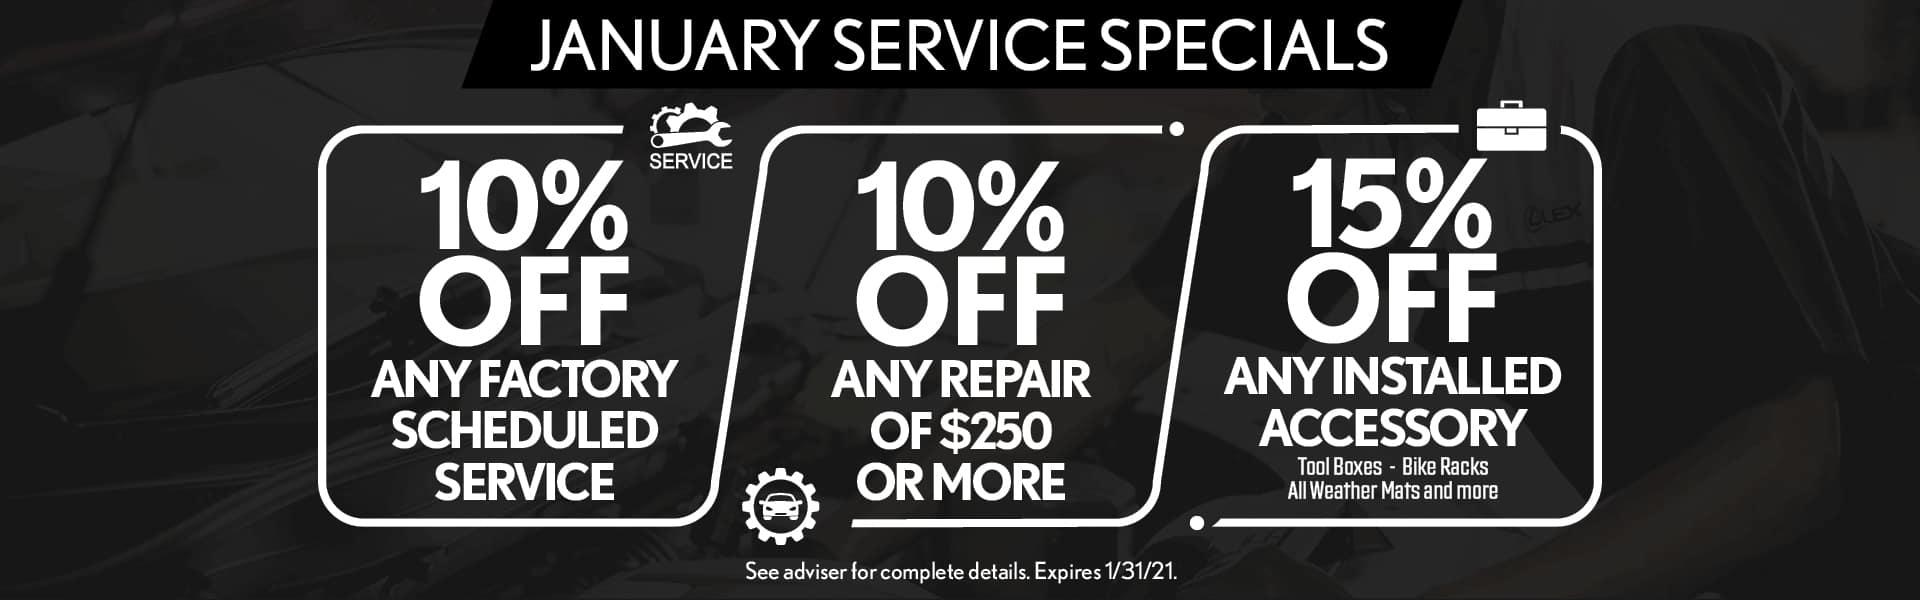 January Service Specials